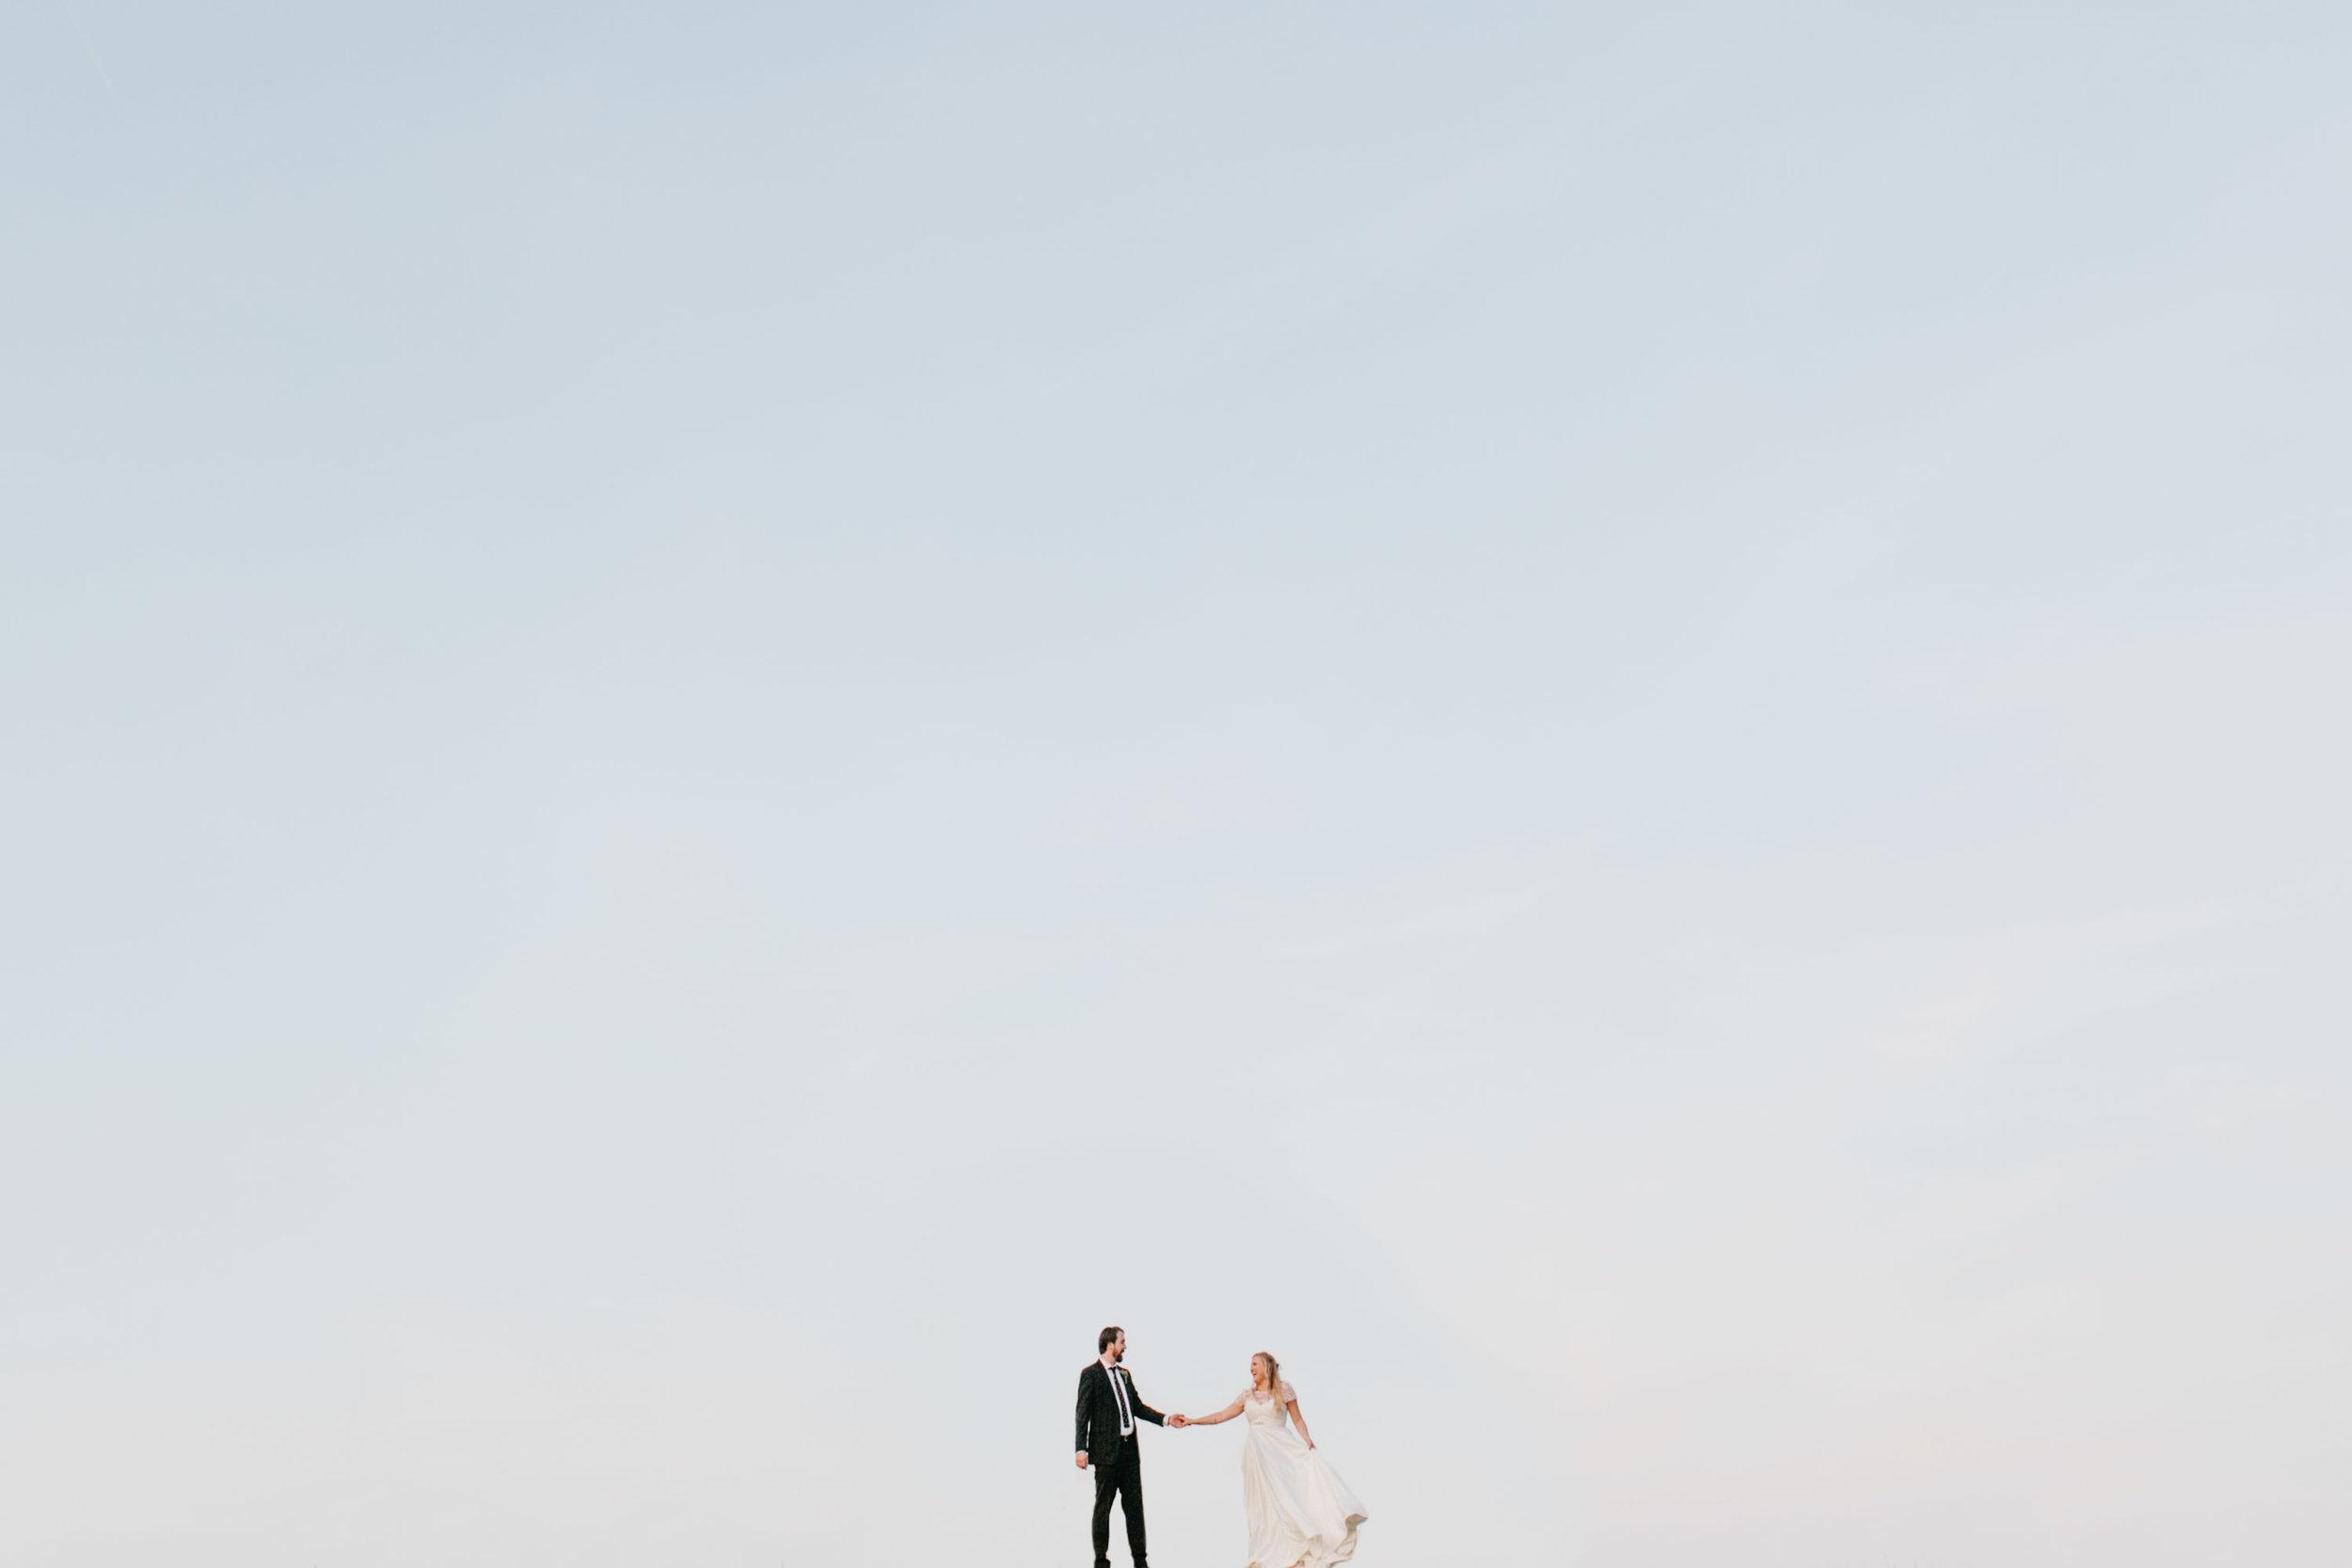 omaha-wedding-photographer_002.jpg